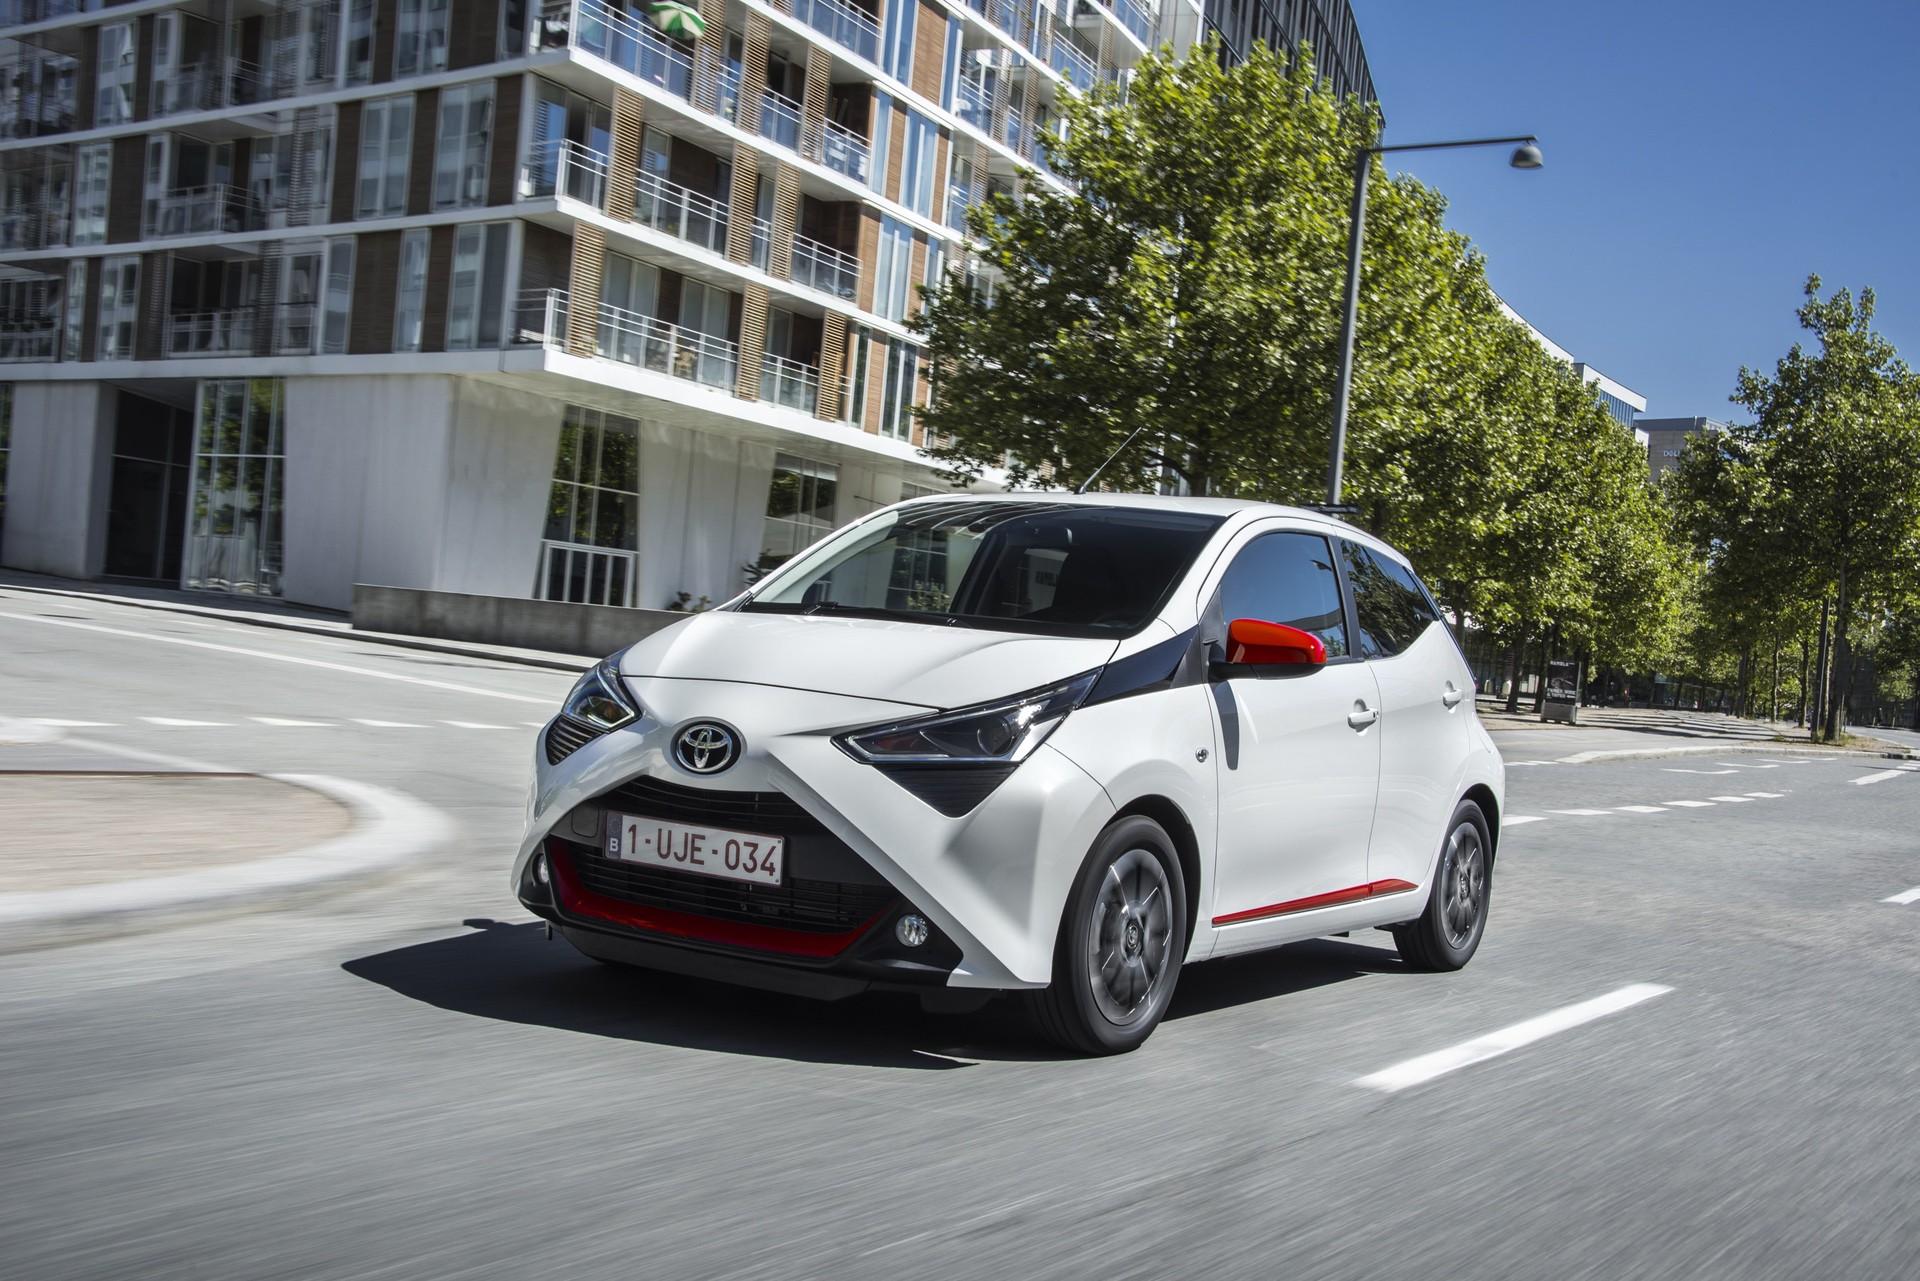 Toyota_Aygo_facelift_presskit_0063